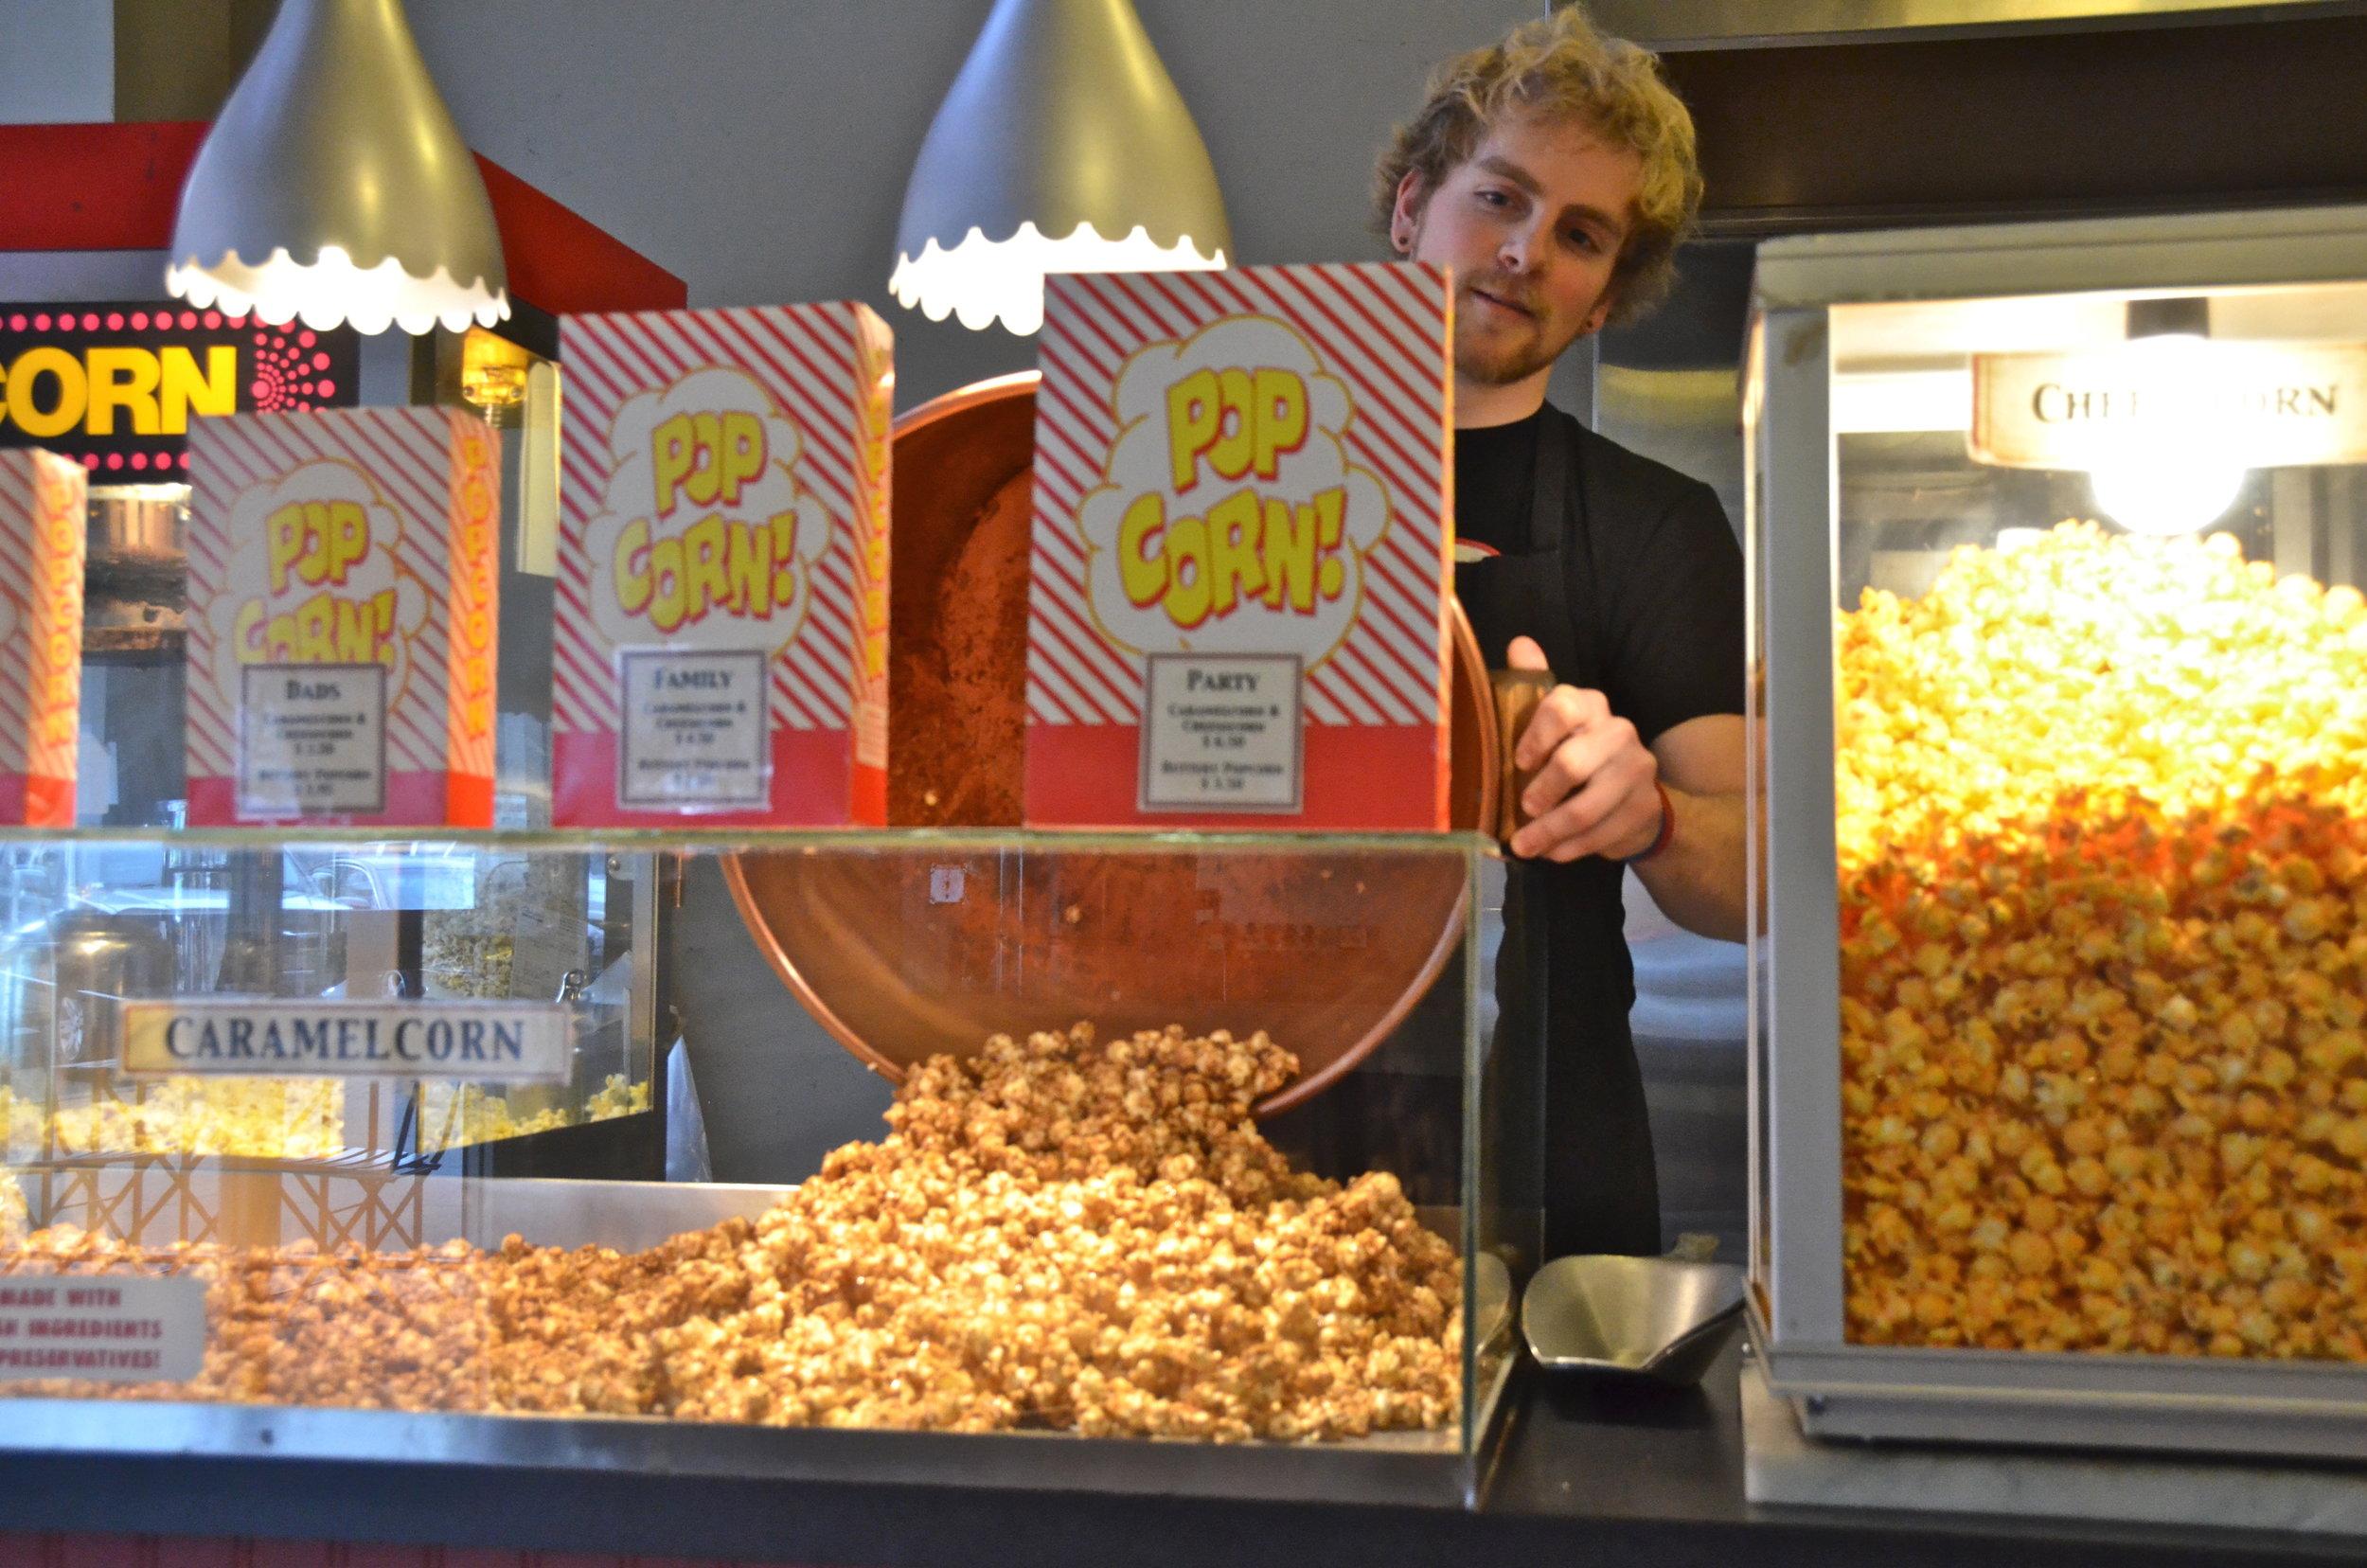 Popcorn, caramel & cheesecorn